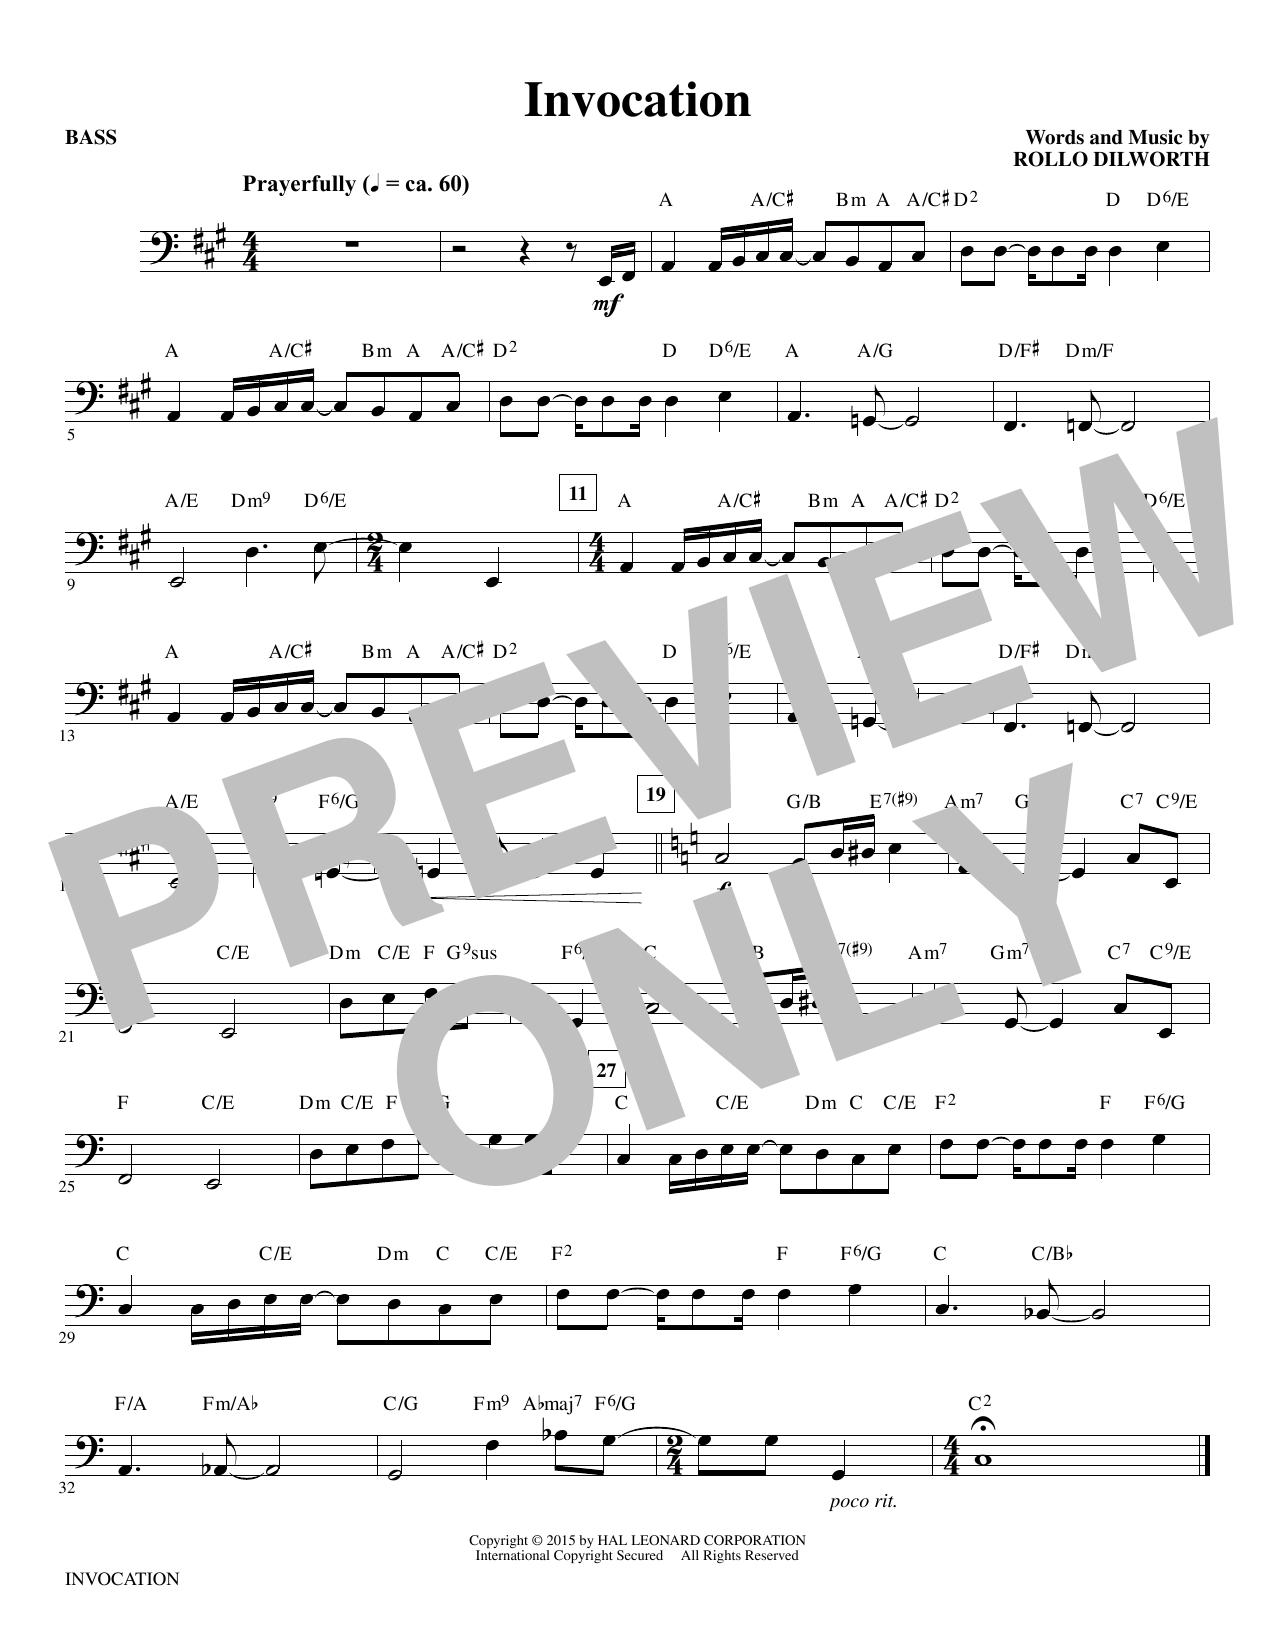 Invocation - Bass sheet music